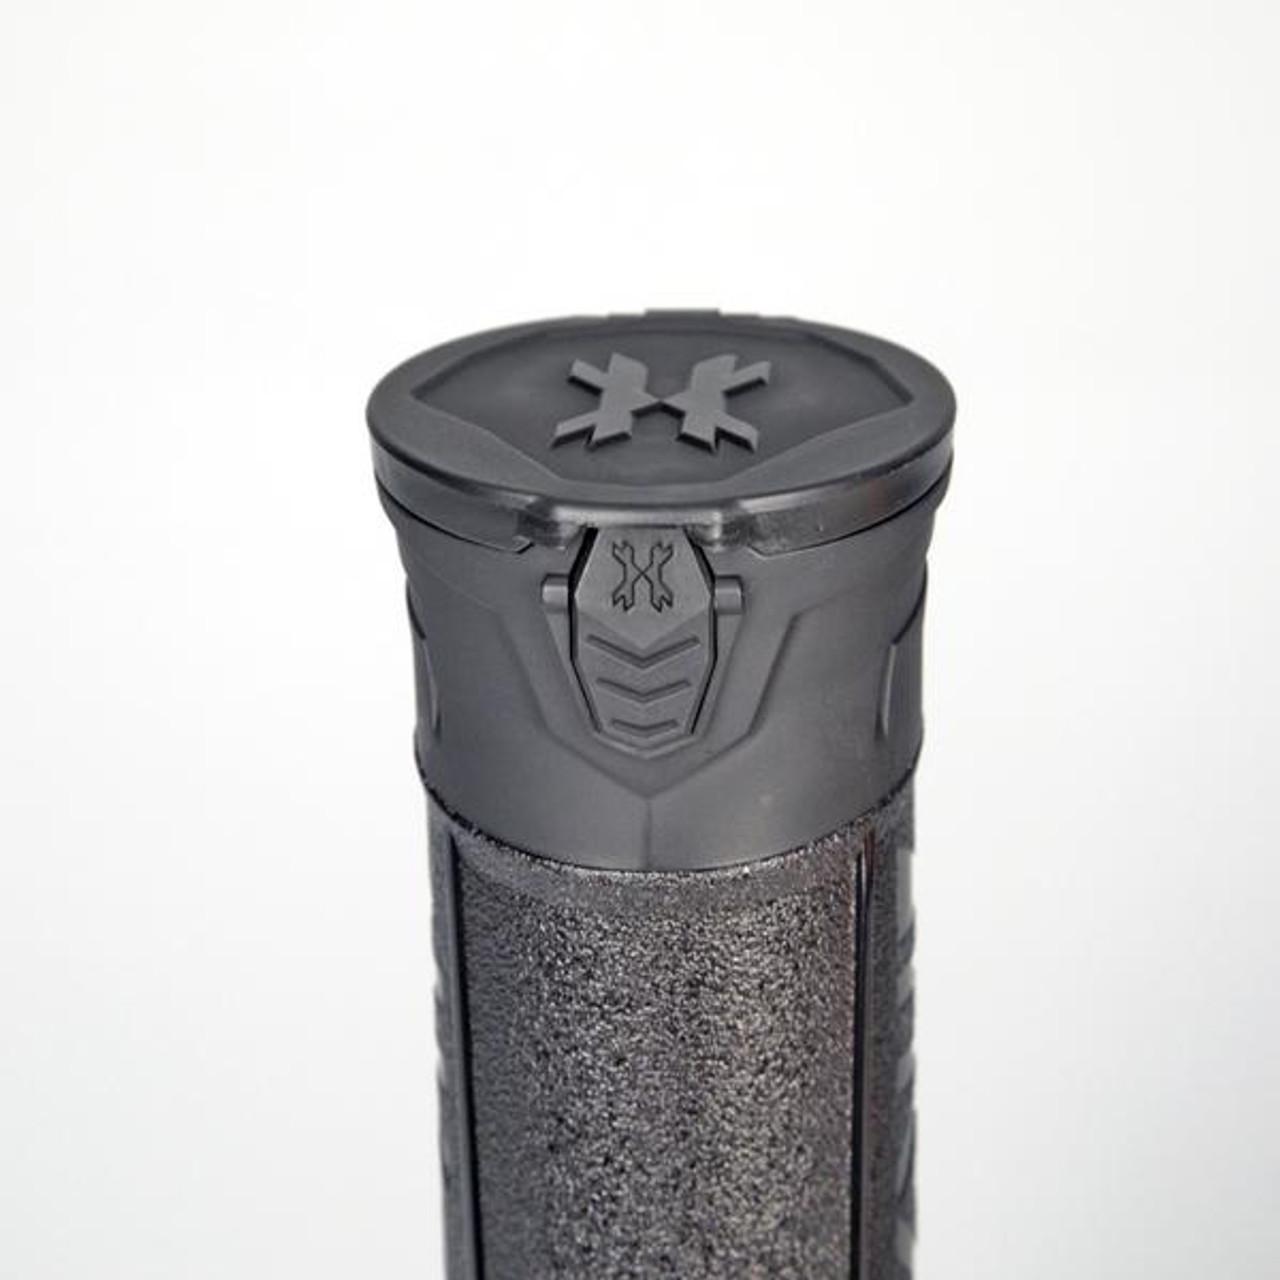 HK - Pod - High Capacity - Smoke/Black